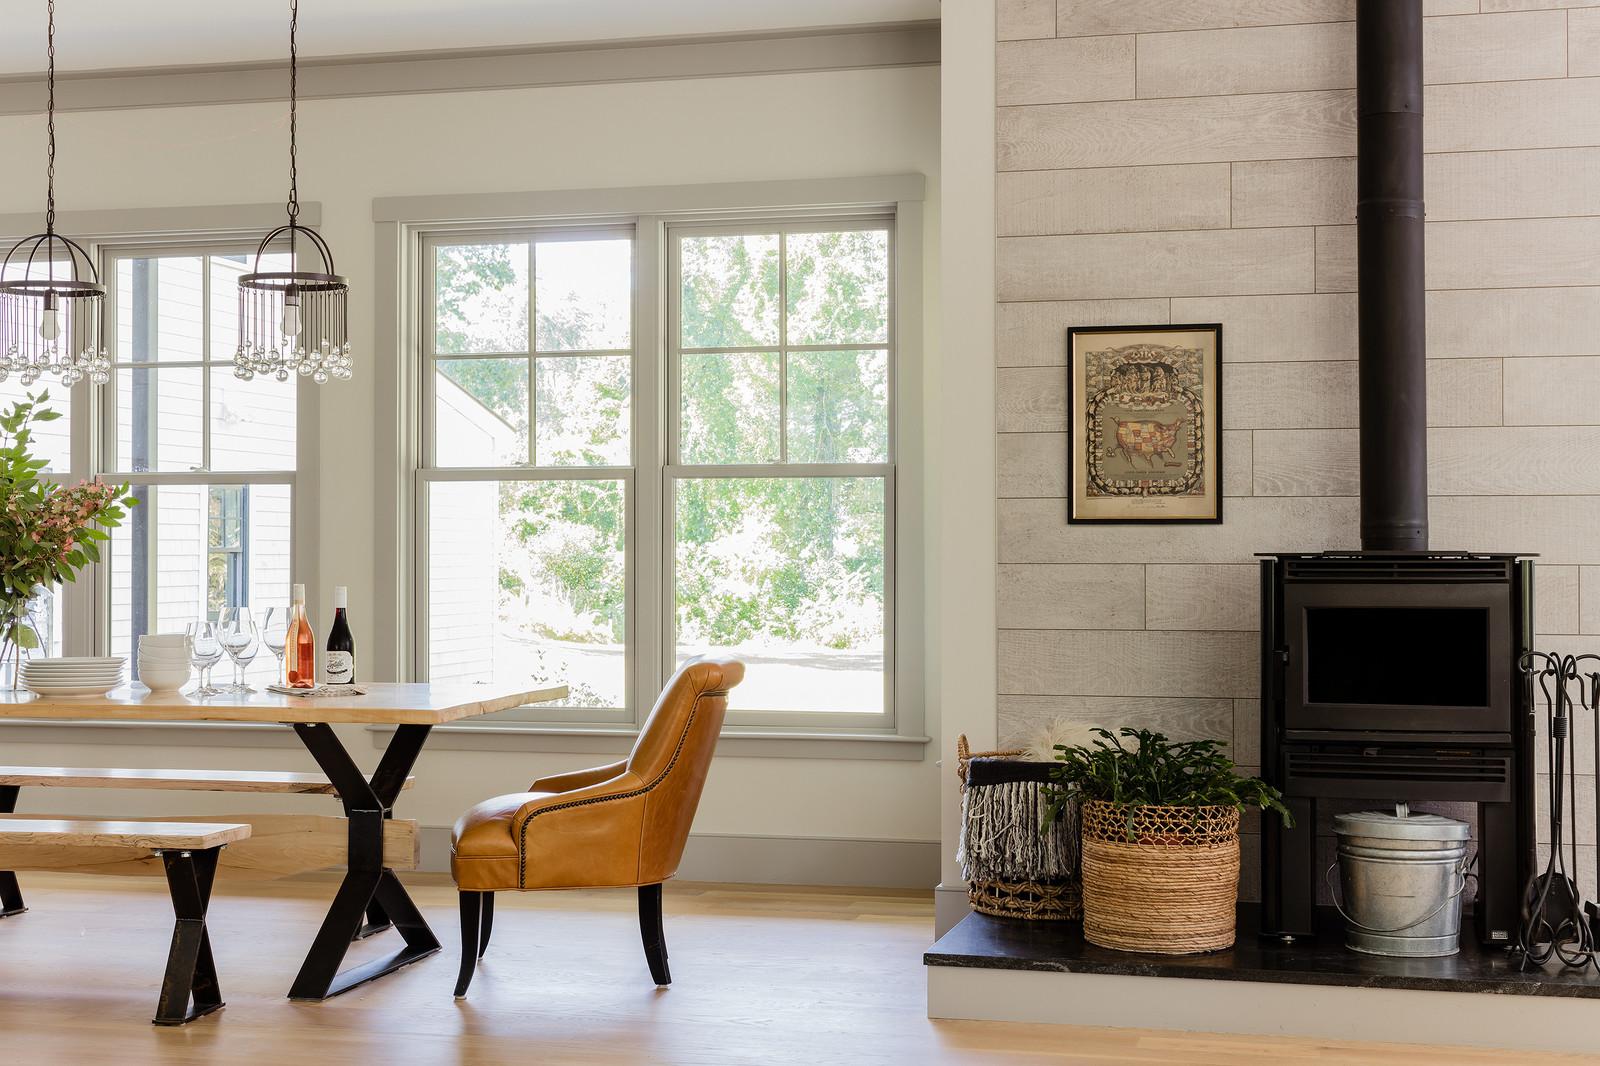 15 Amazing Ways To Use White Walls Grey Trim In Your House Jimenezphoto